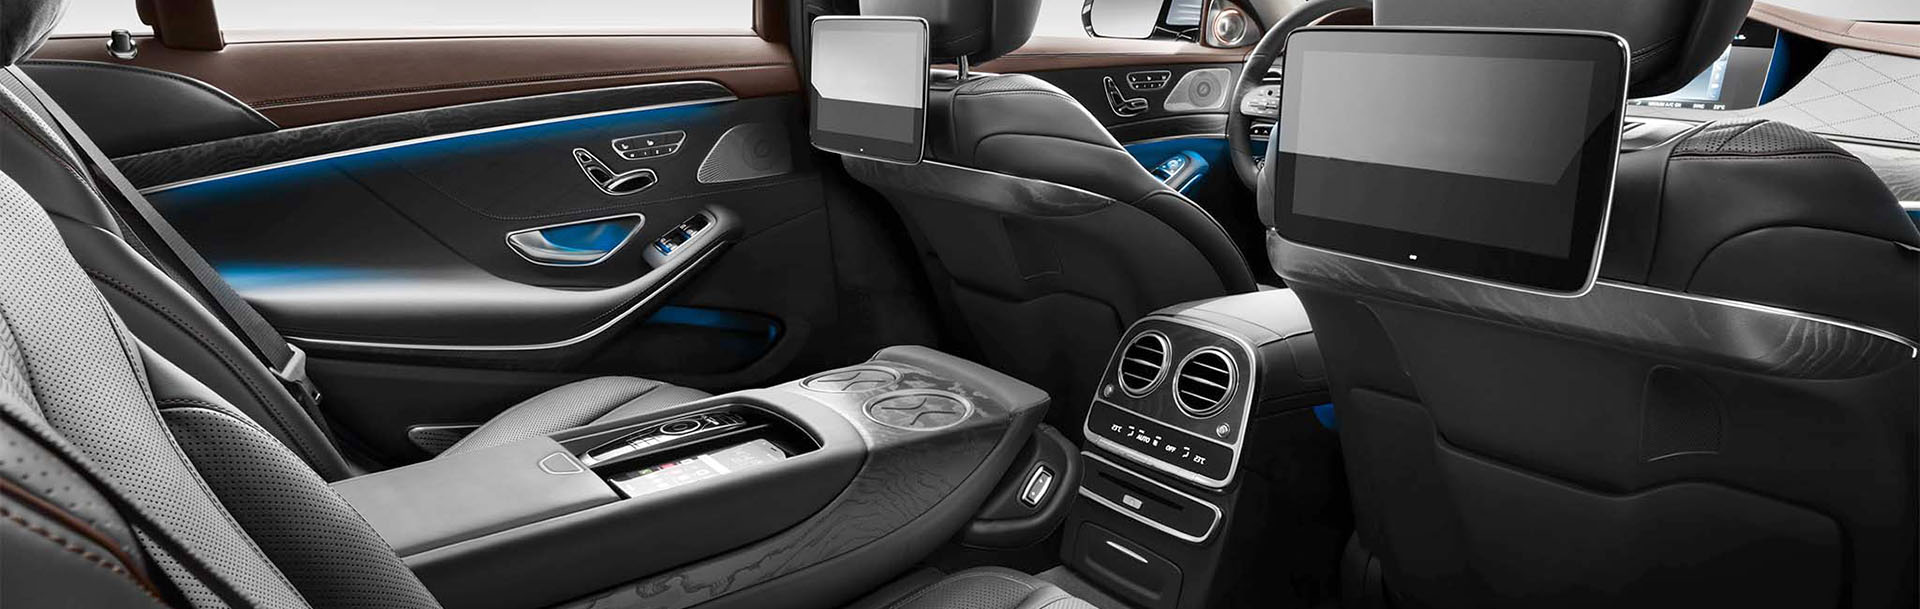 interieur Mercedes S taxi